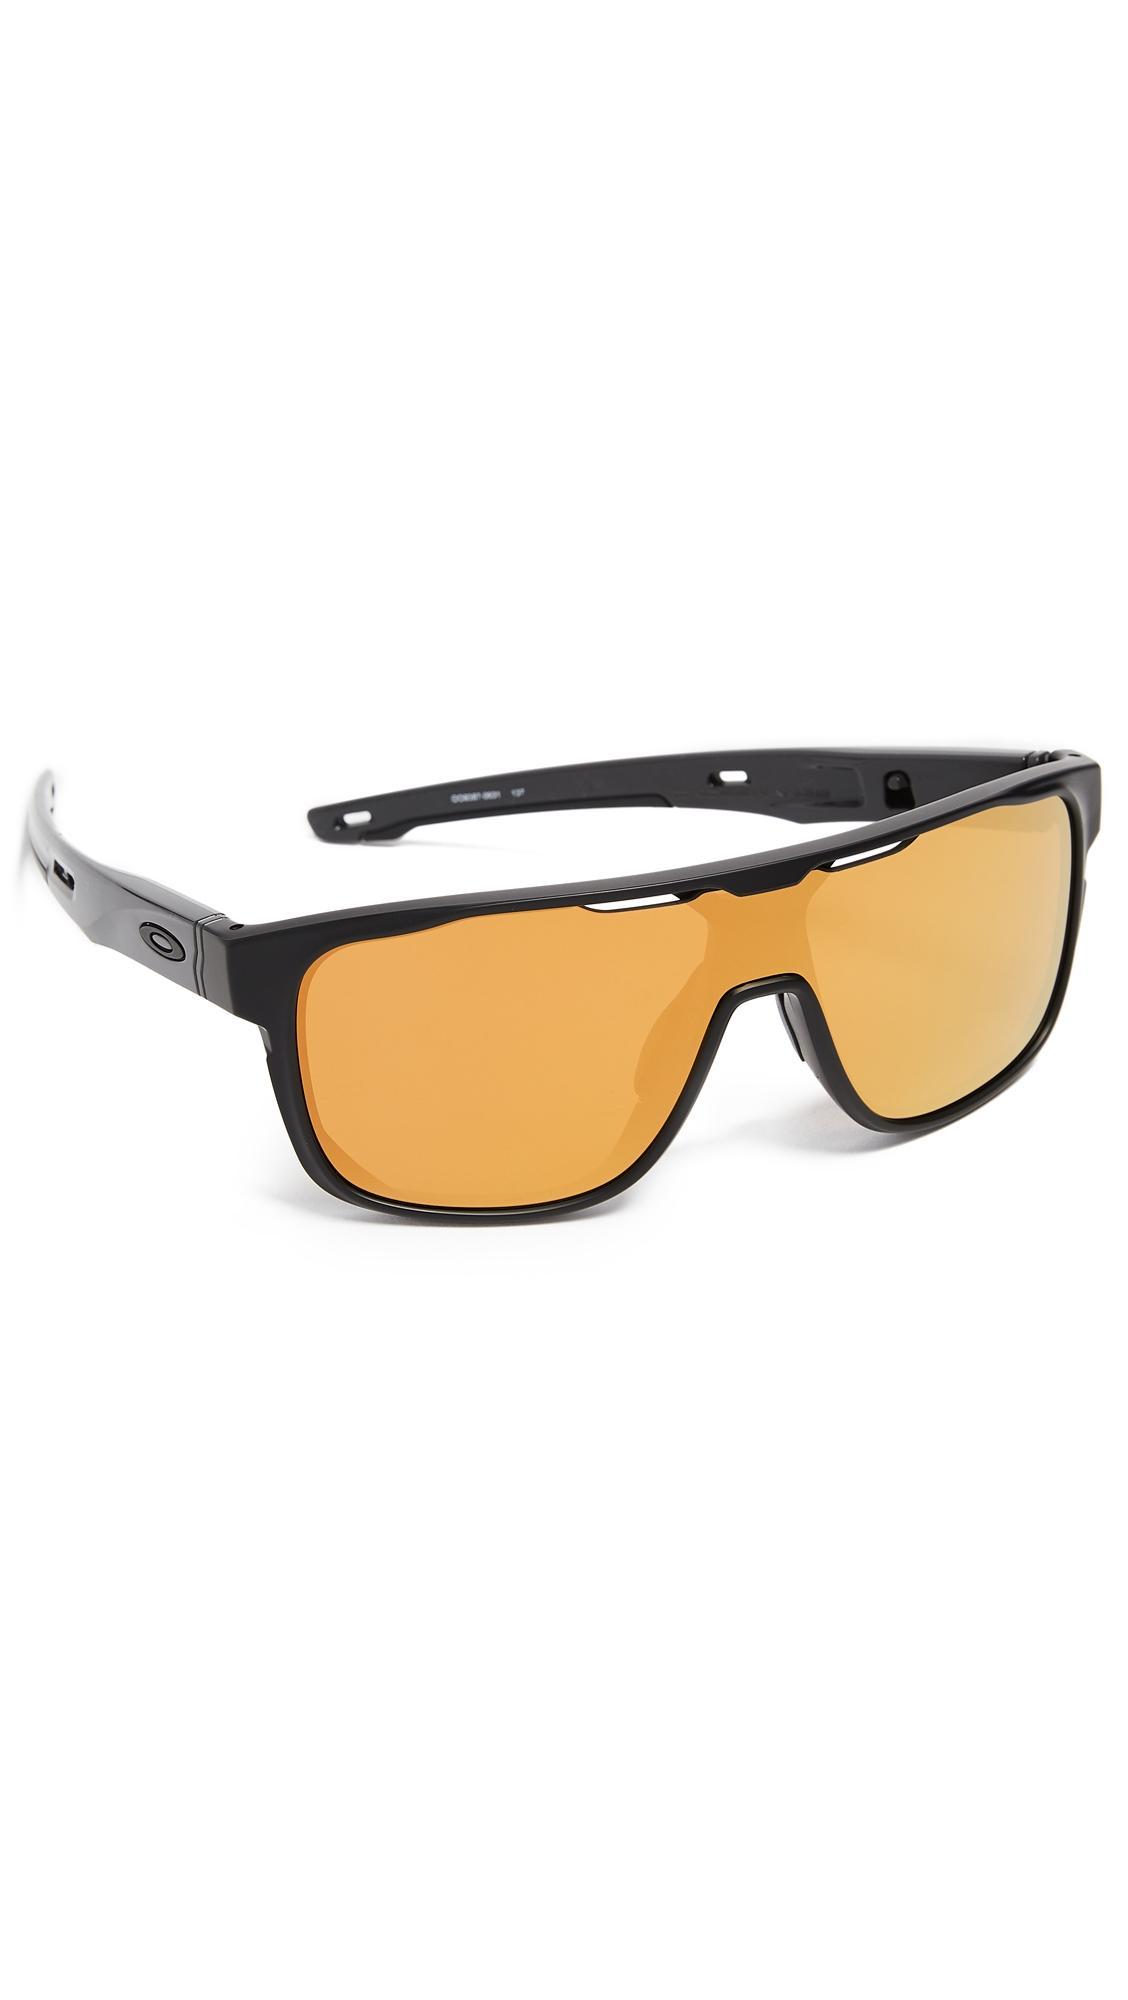 a4bb7f6ee6 Oakley Crossrange Shield Sunglasses In Black 24K Iridium